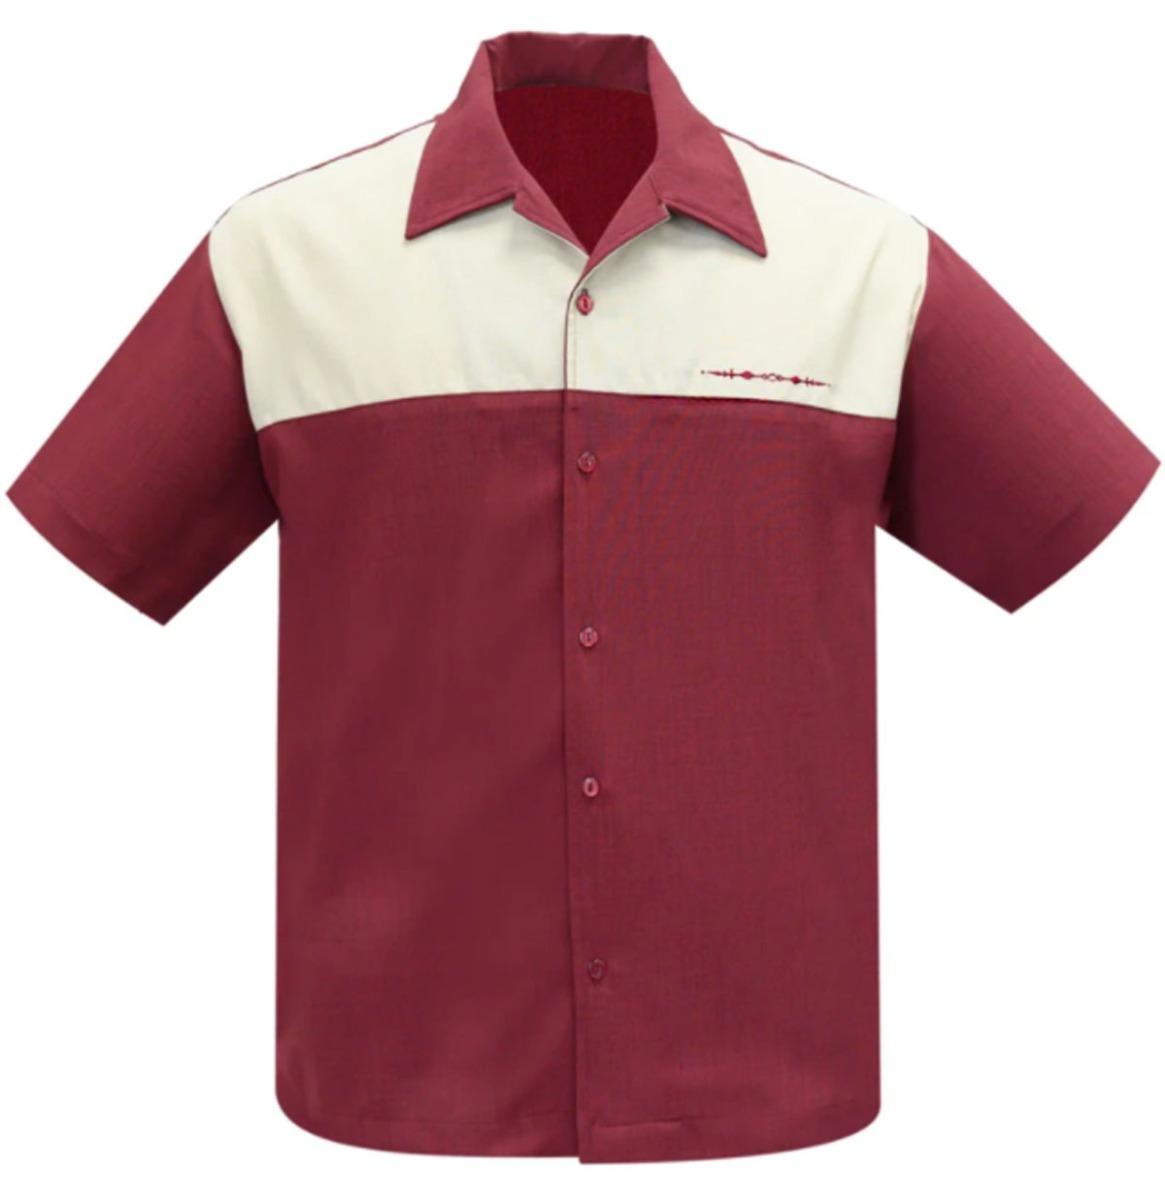 Steady Clothing The Earl Shirt Donkerrood / Beige